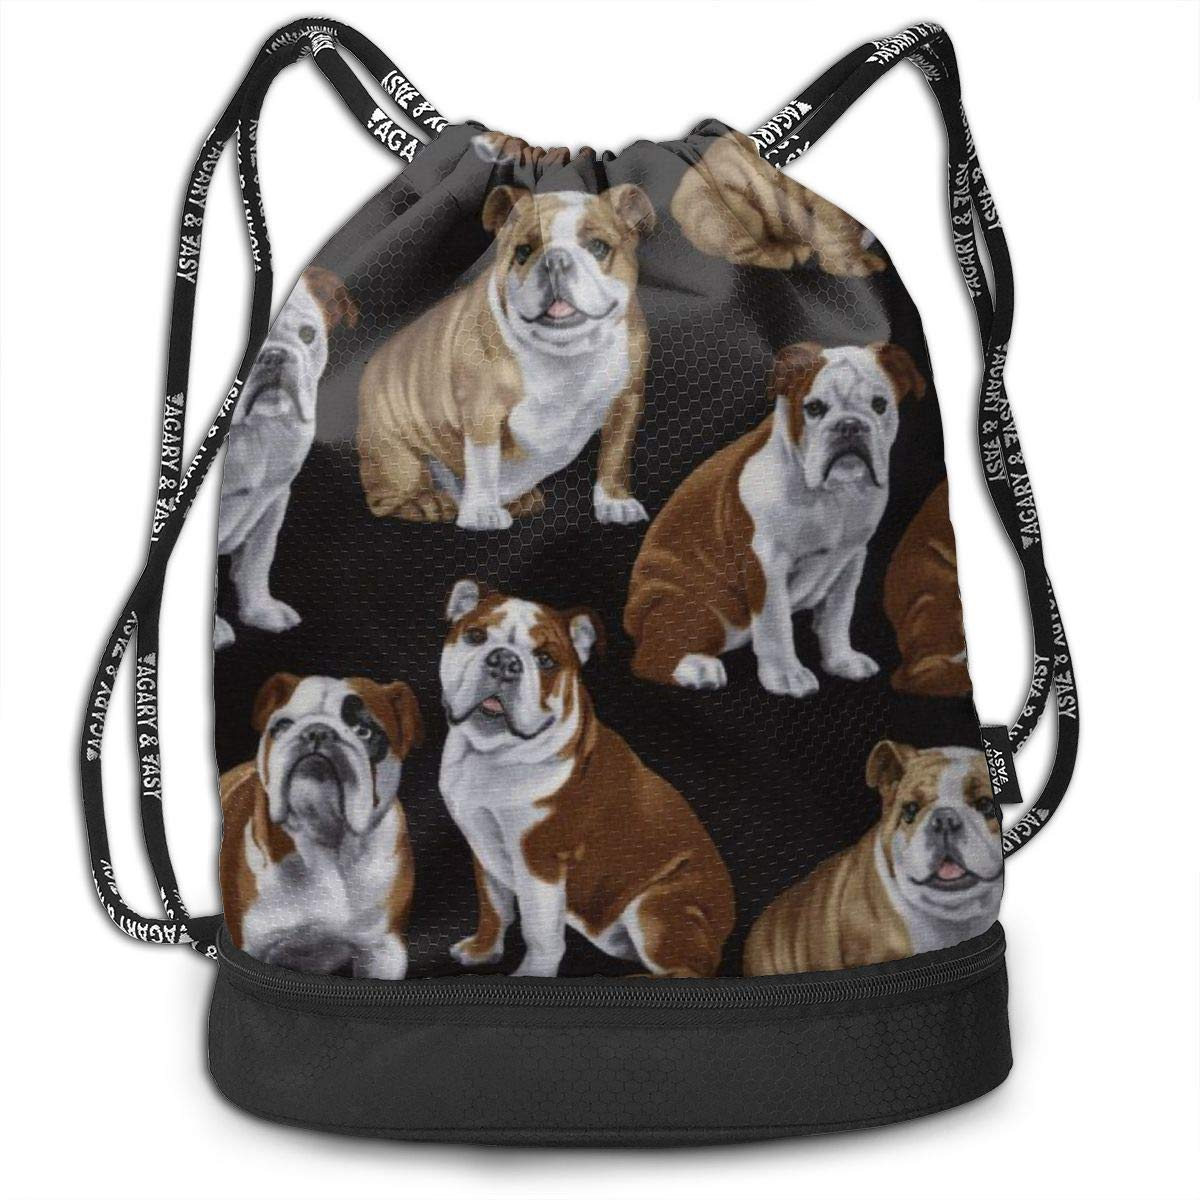 English Bulldogs Multifunctional Bundle Backpack Shoulder Bag For Men And Women